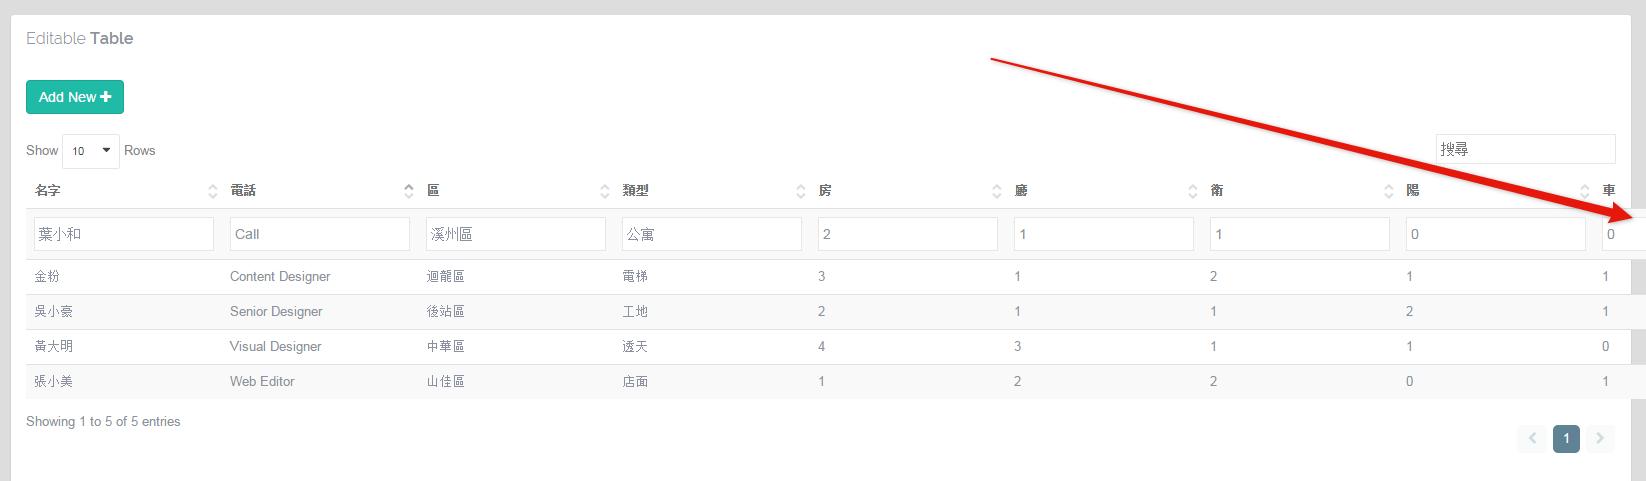 BOOTSTRAP 4 DATEPICKER W3SCHOOLS - Cdnjs Bootstrap Min Js